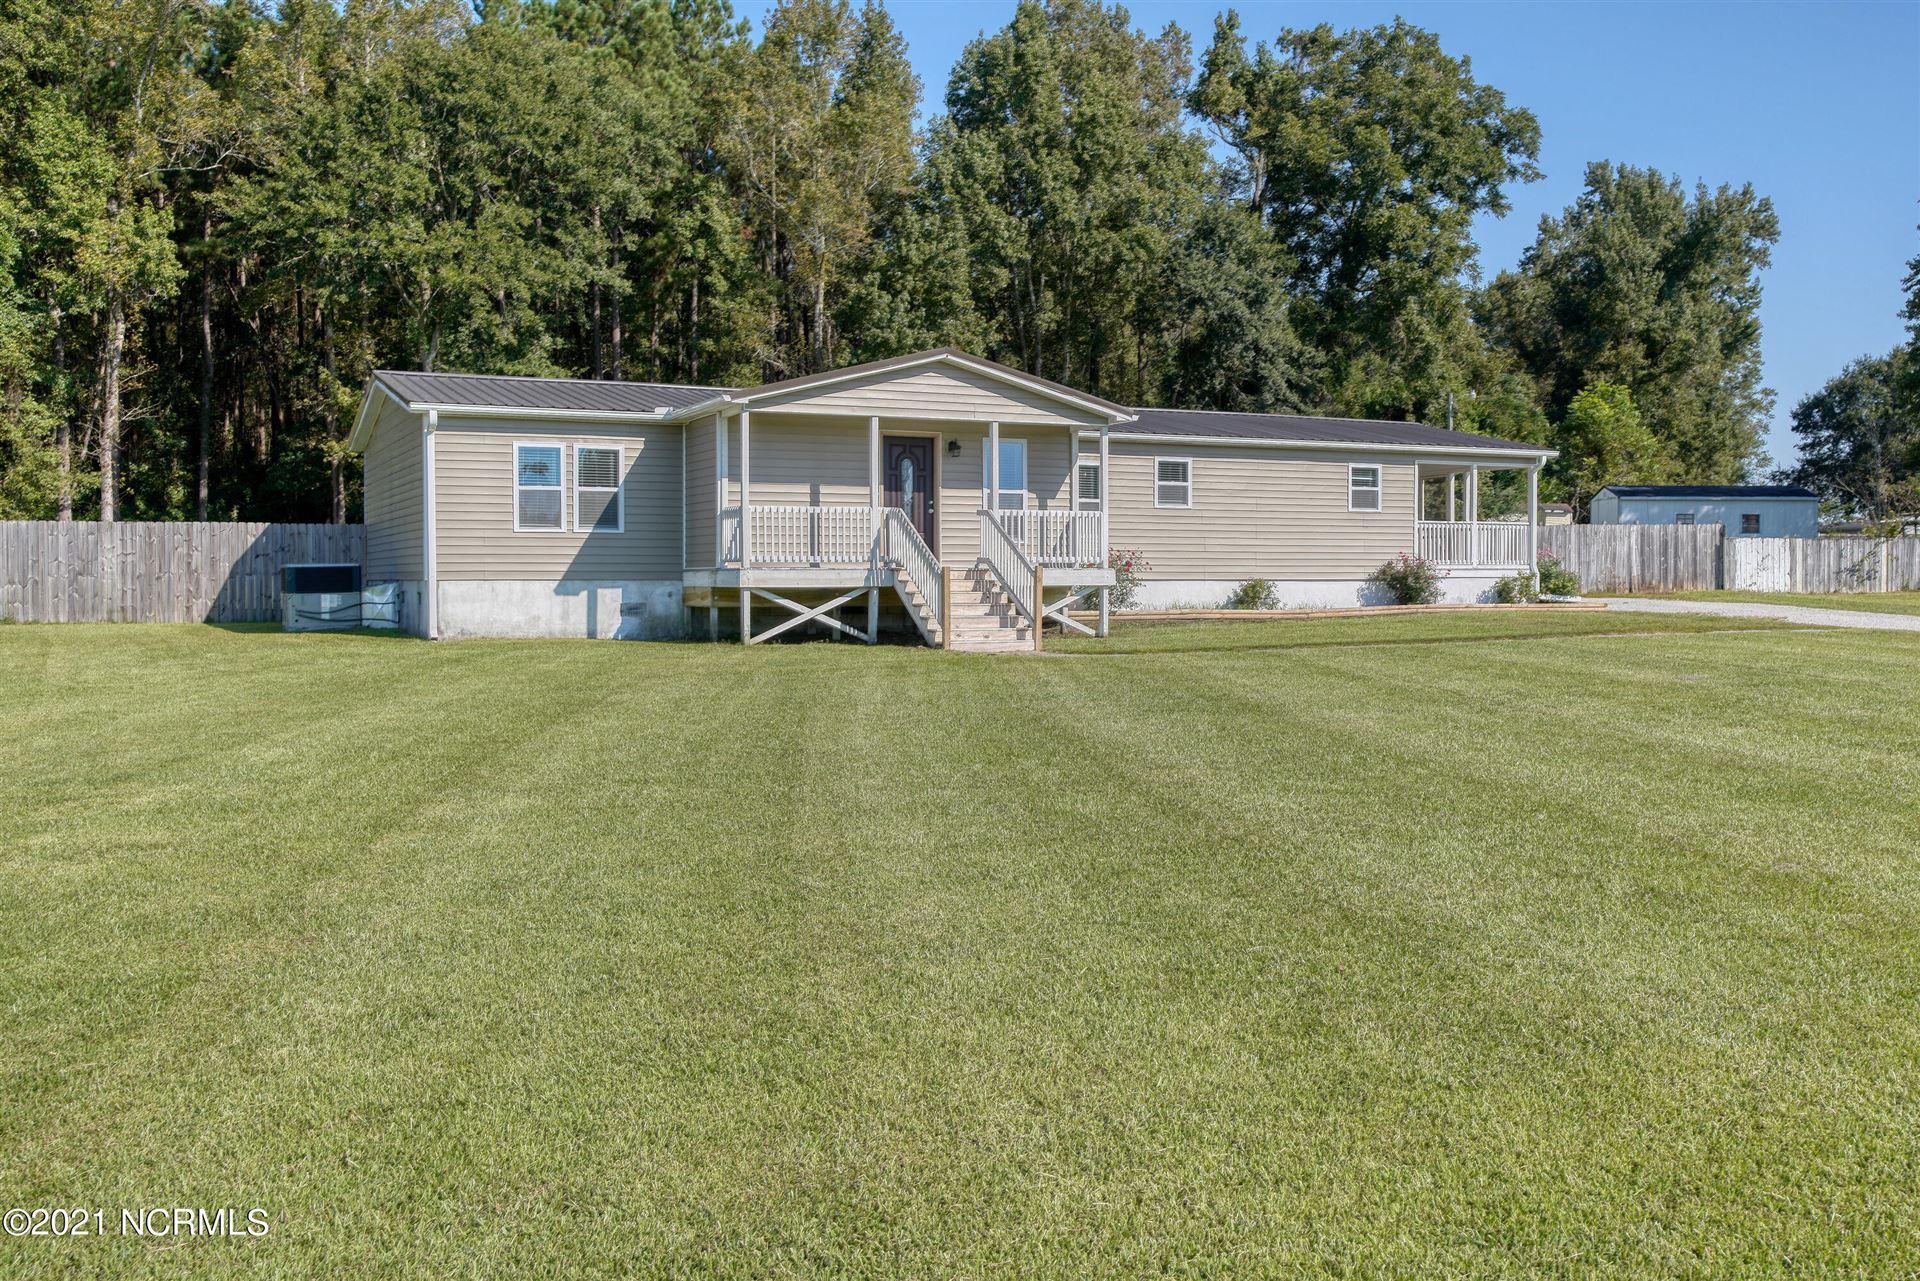 Photo of 104 Woodcroft Lane, Rocky Point, NC 28457 (MLS # 100292540)